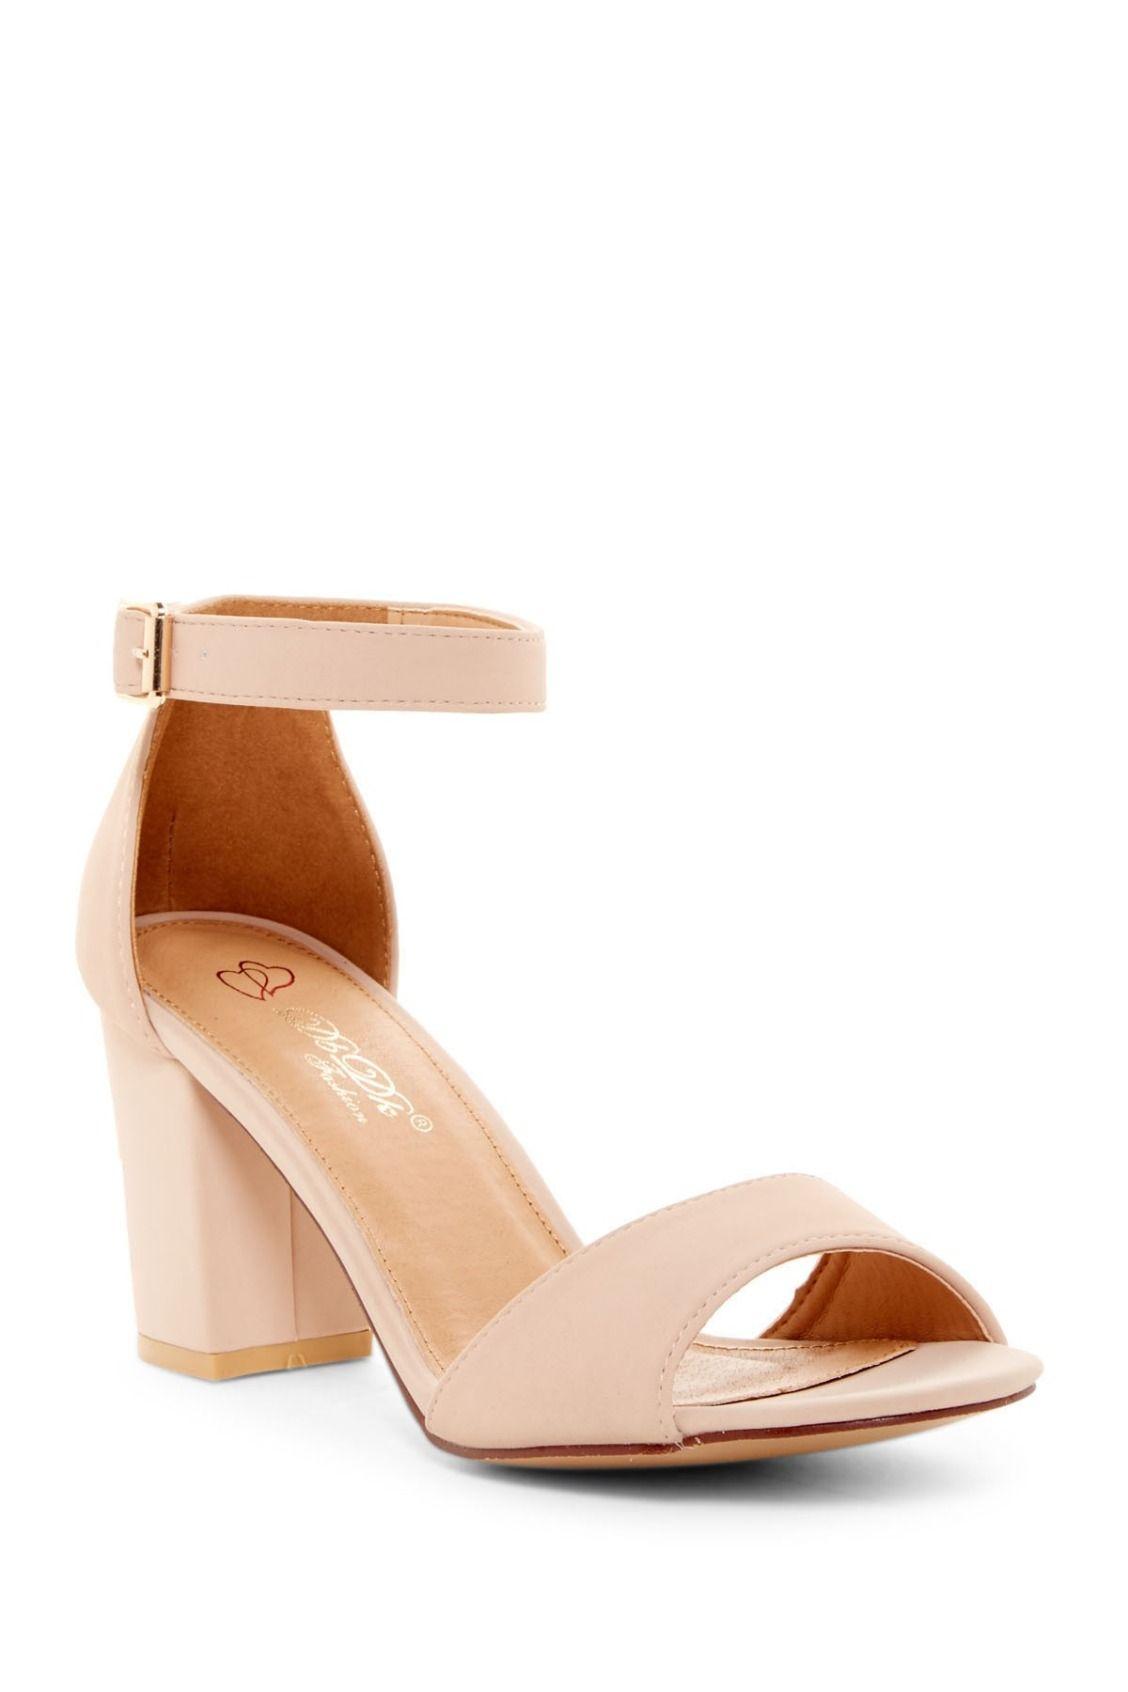 45bc07492db Classic Nude DBDK Fashion Nicola Block Heel Sandals Zapatos